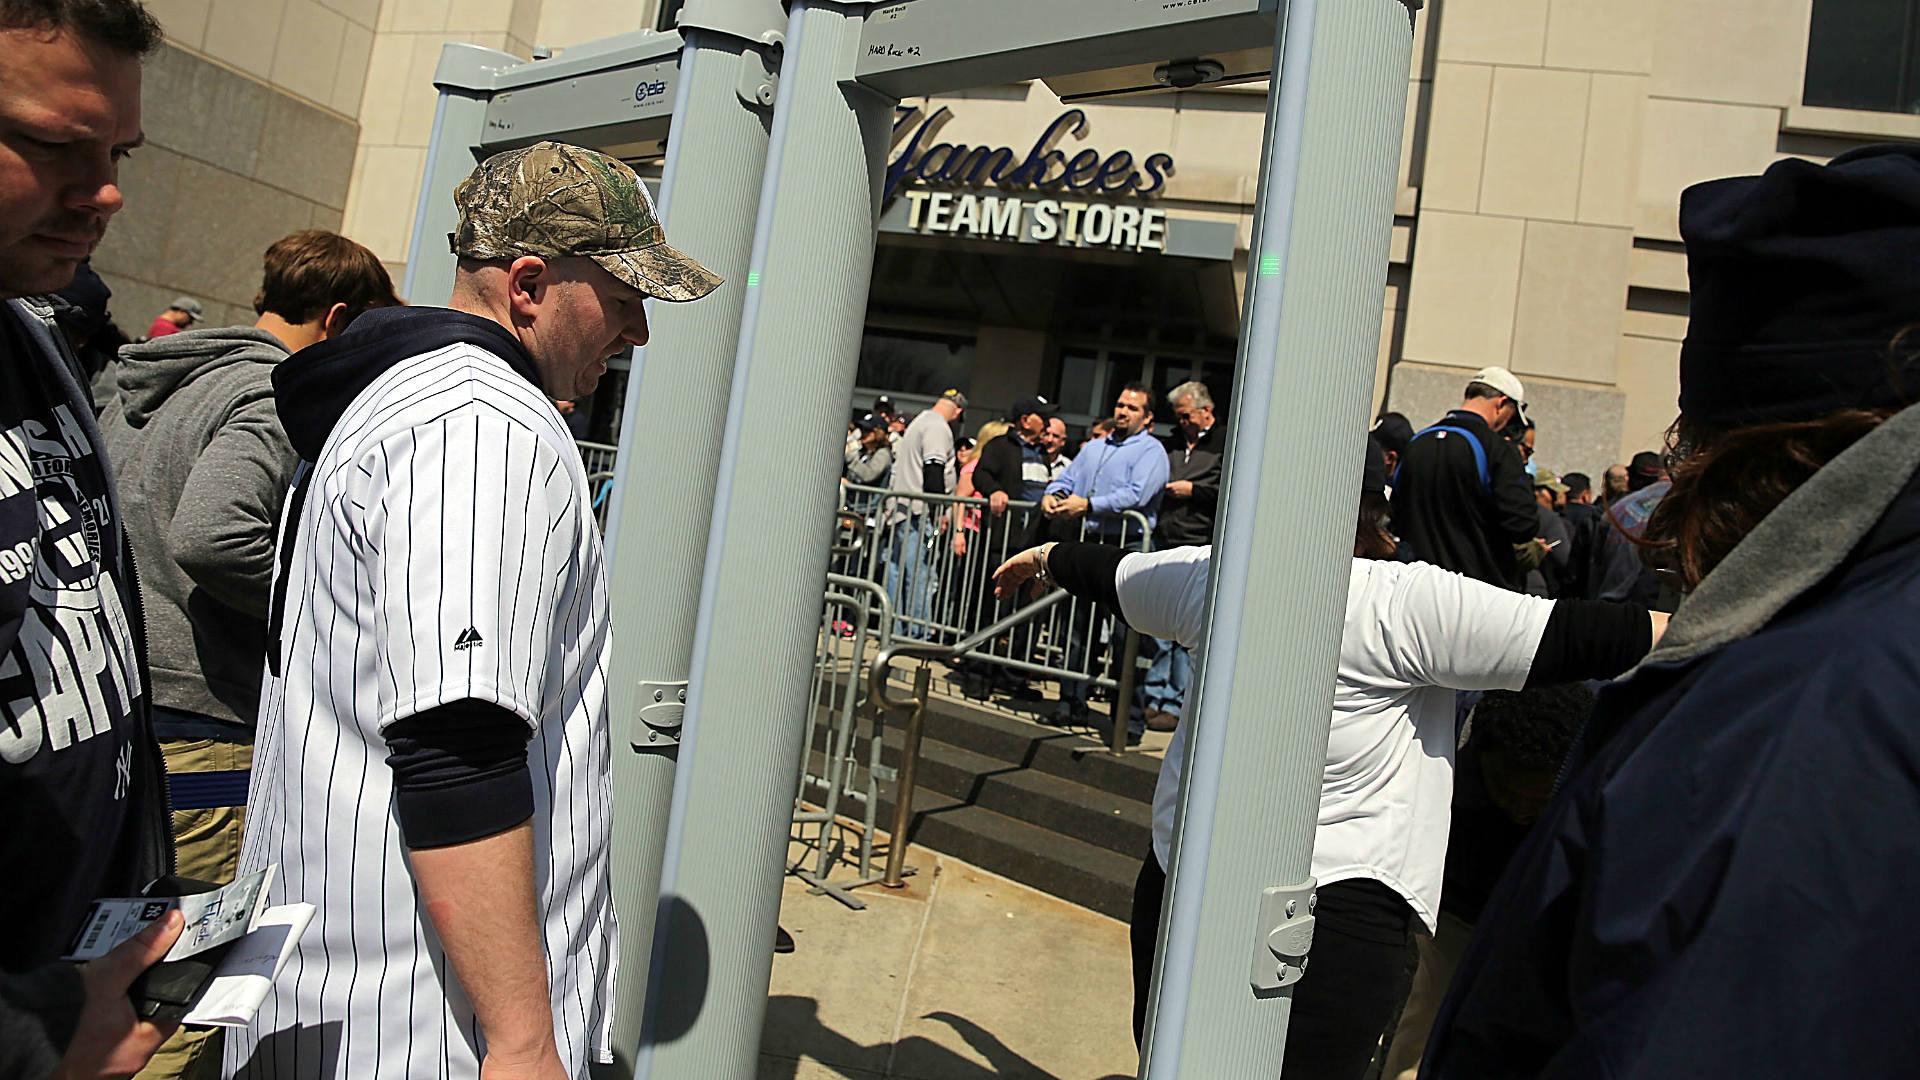 Metal-detectors-yankee-stadium-baseball-FTR-Getty.jpg